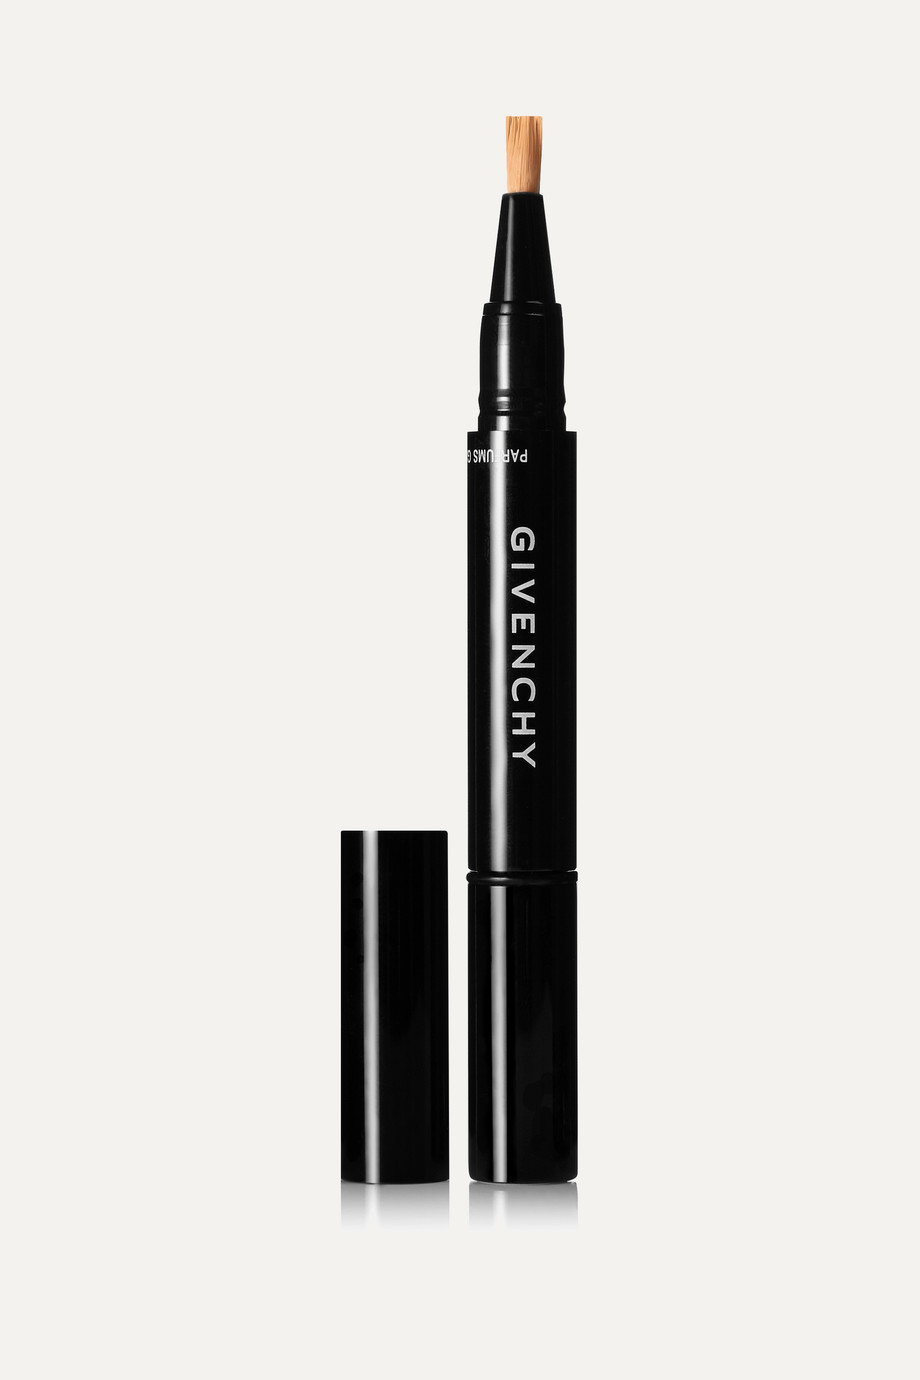 Givenchy Beauty Mister Instant Corrective Pen - Caramel 140